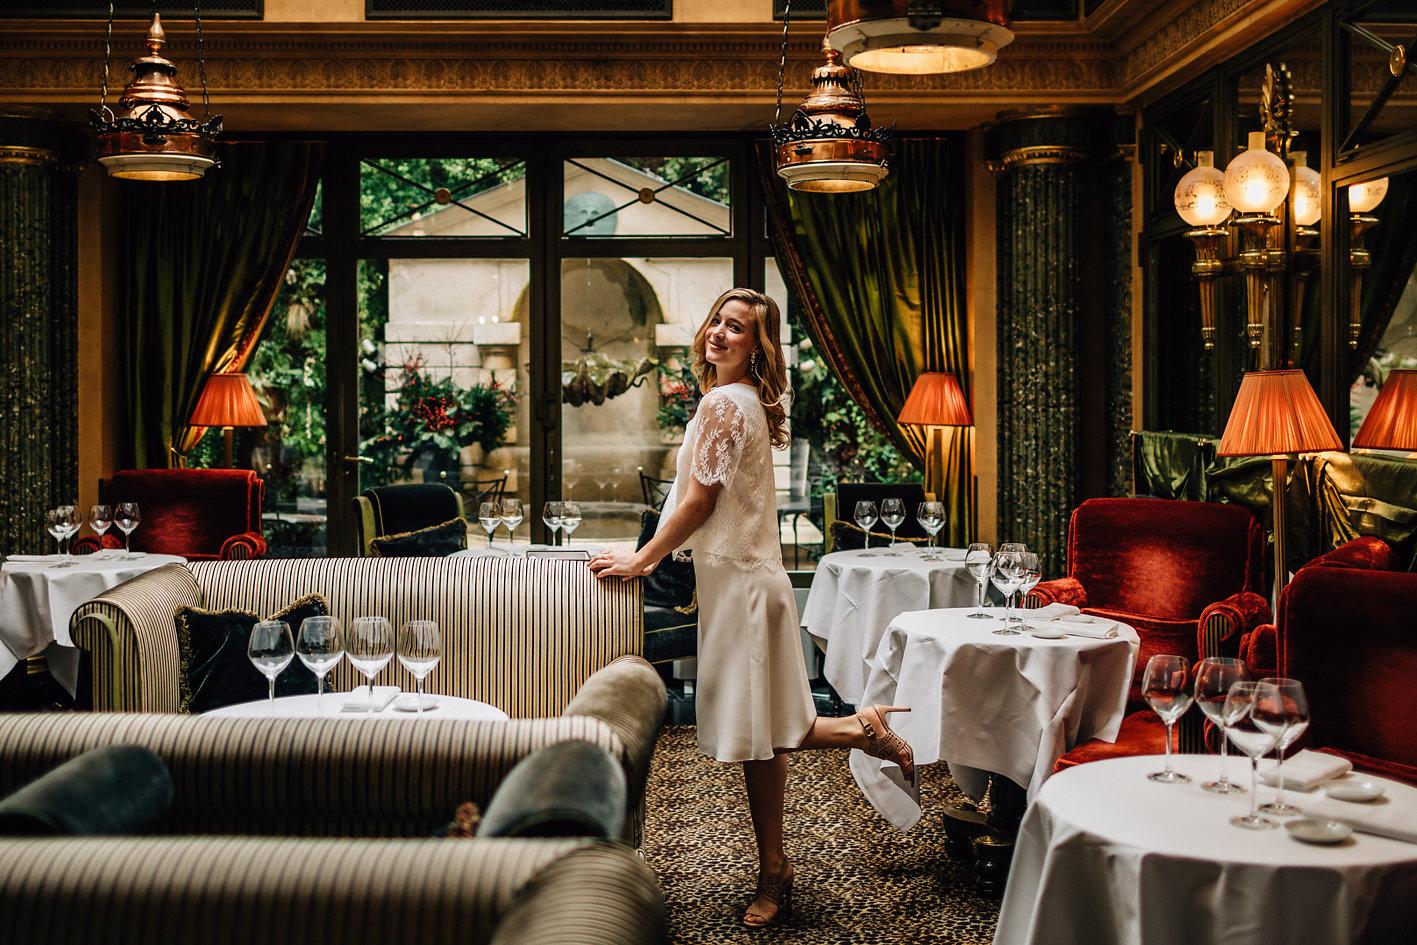 pierreatelier-photographe-paris-robe-mariage-organse-141.jpg